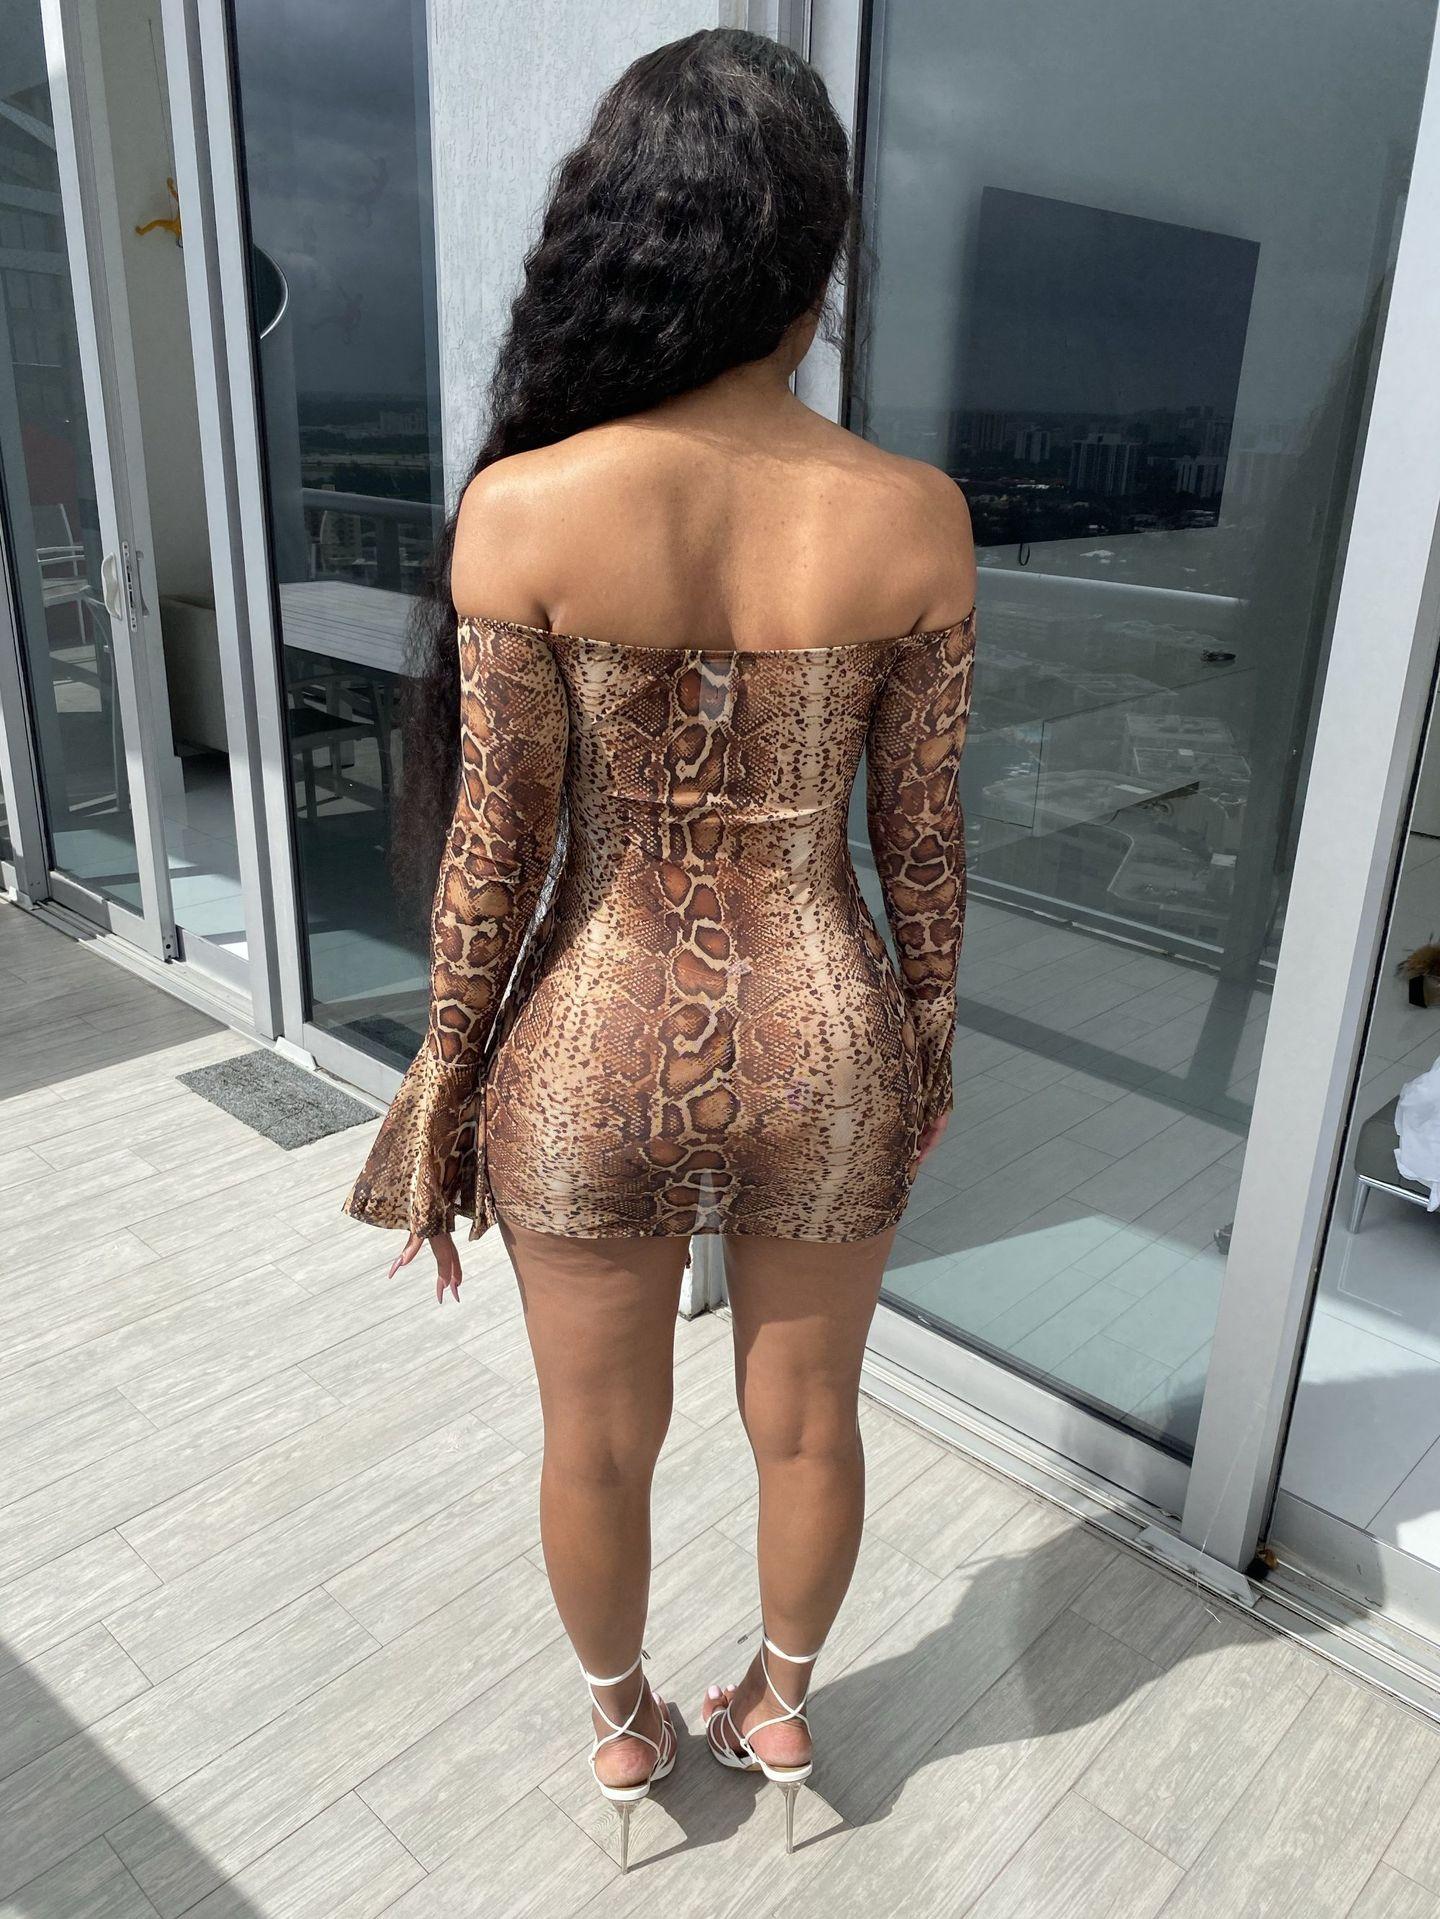 H9cd72625efbd410fb3cec32bf886ebbeD - Adogirl Snake Print Long Sleeve Dress Women Evening Party Night Dresses Sexy Off Shoulder Drawstring Bodycon Slim Mini Dress